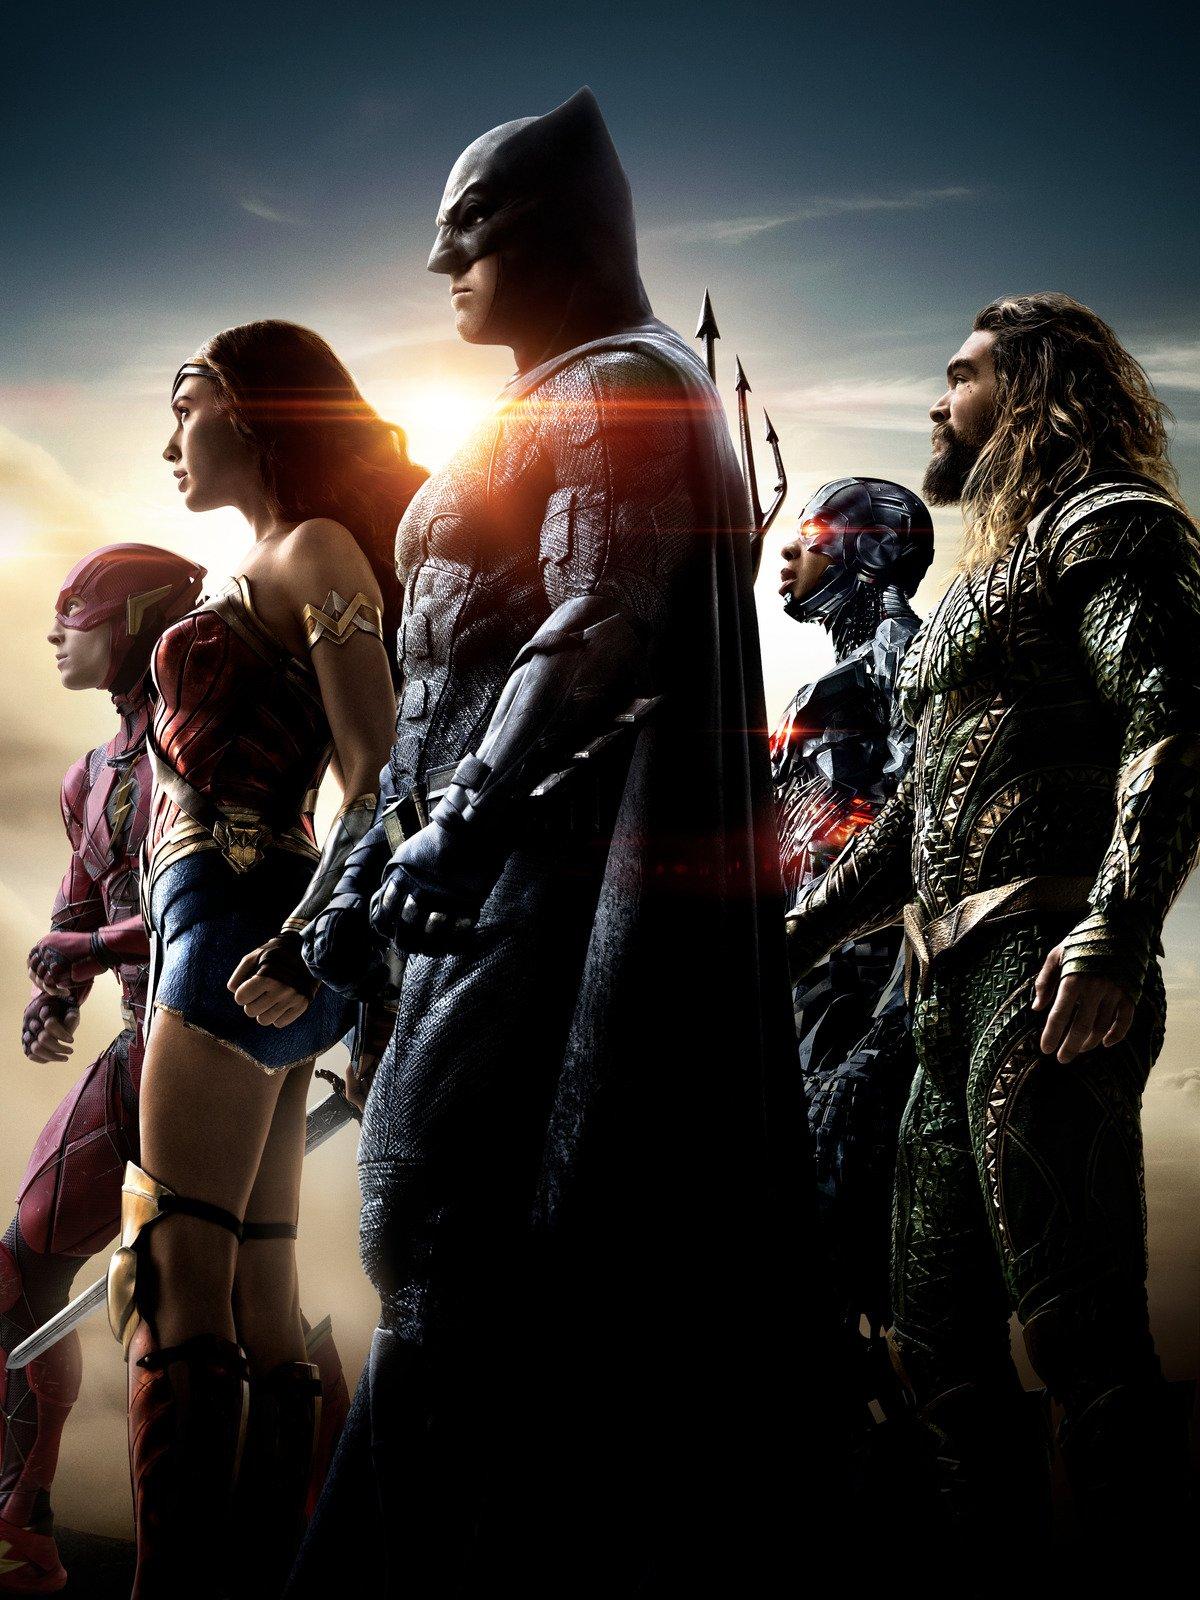 Amazon.com: Watch Justice League: Trailer | Prime Video